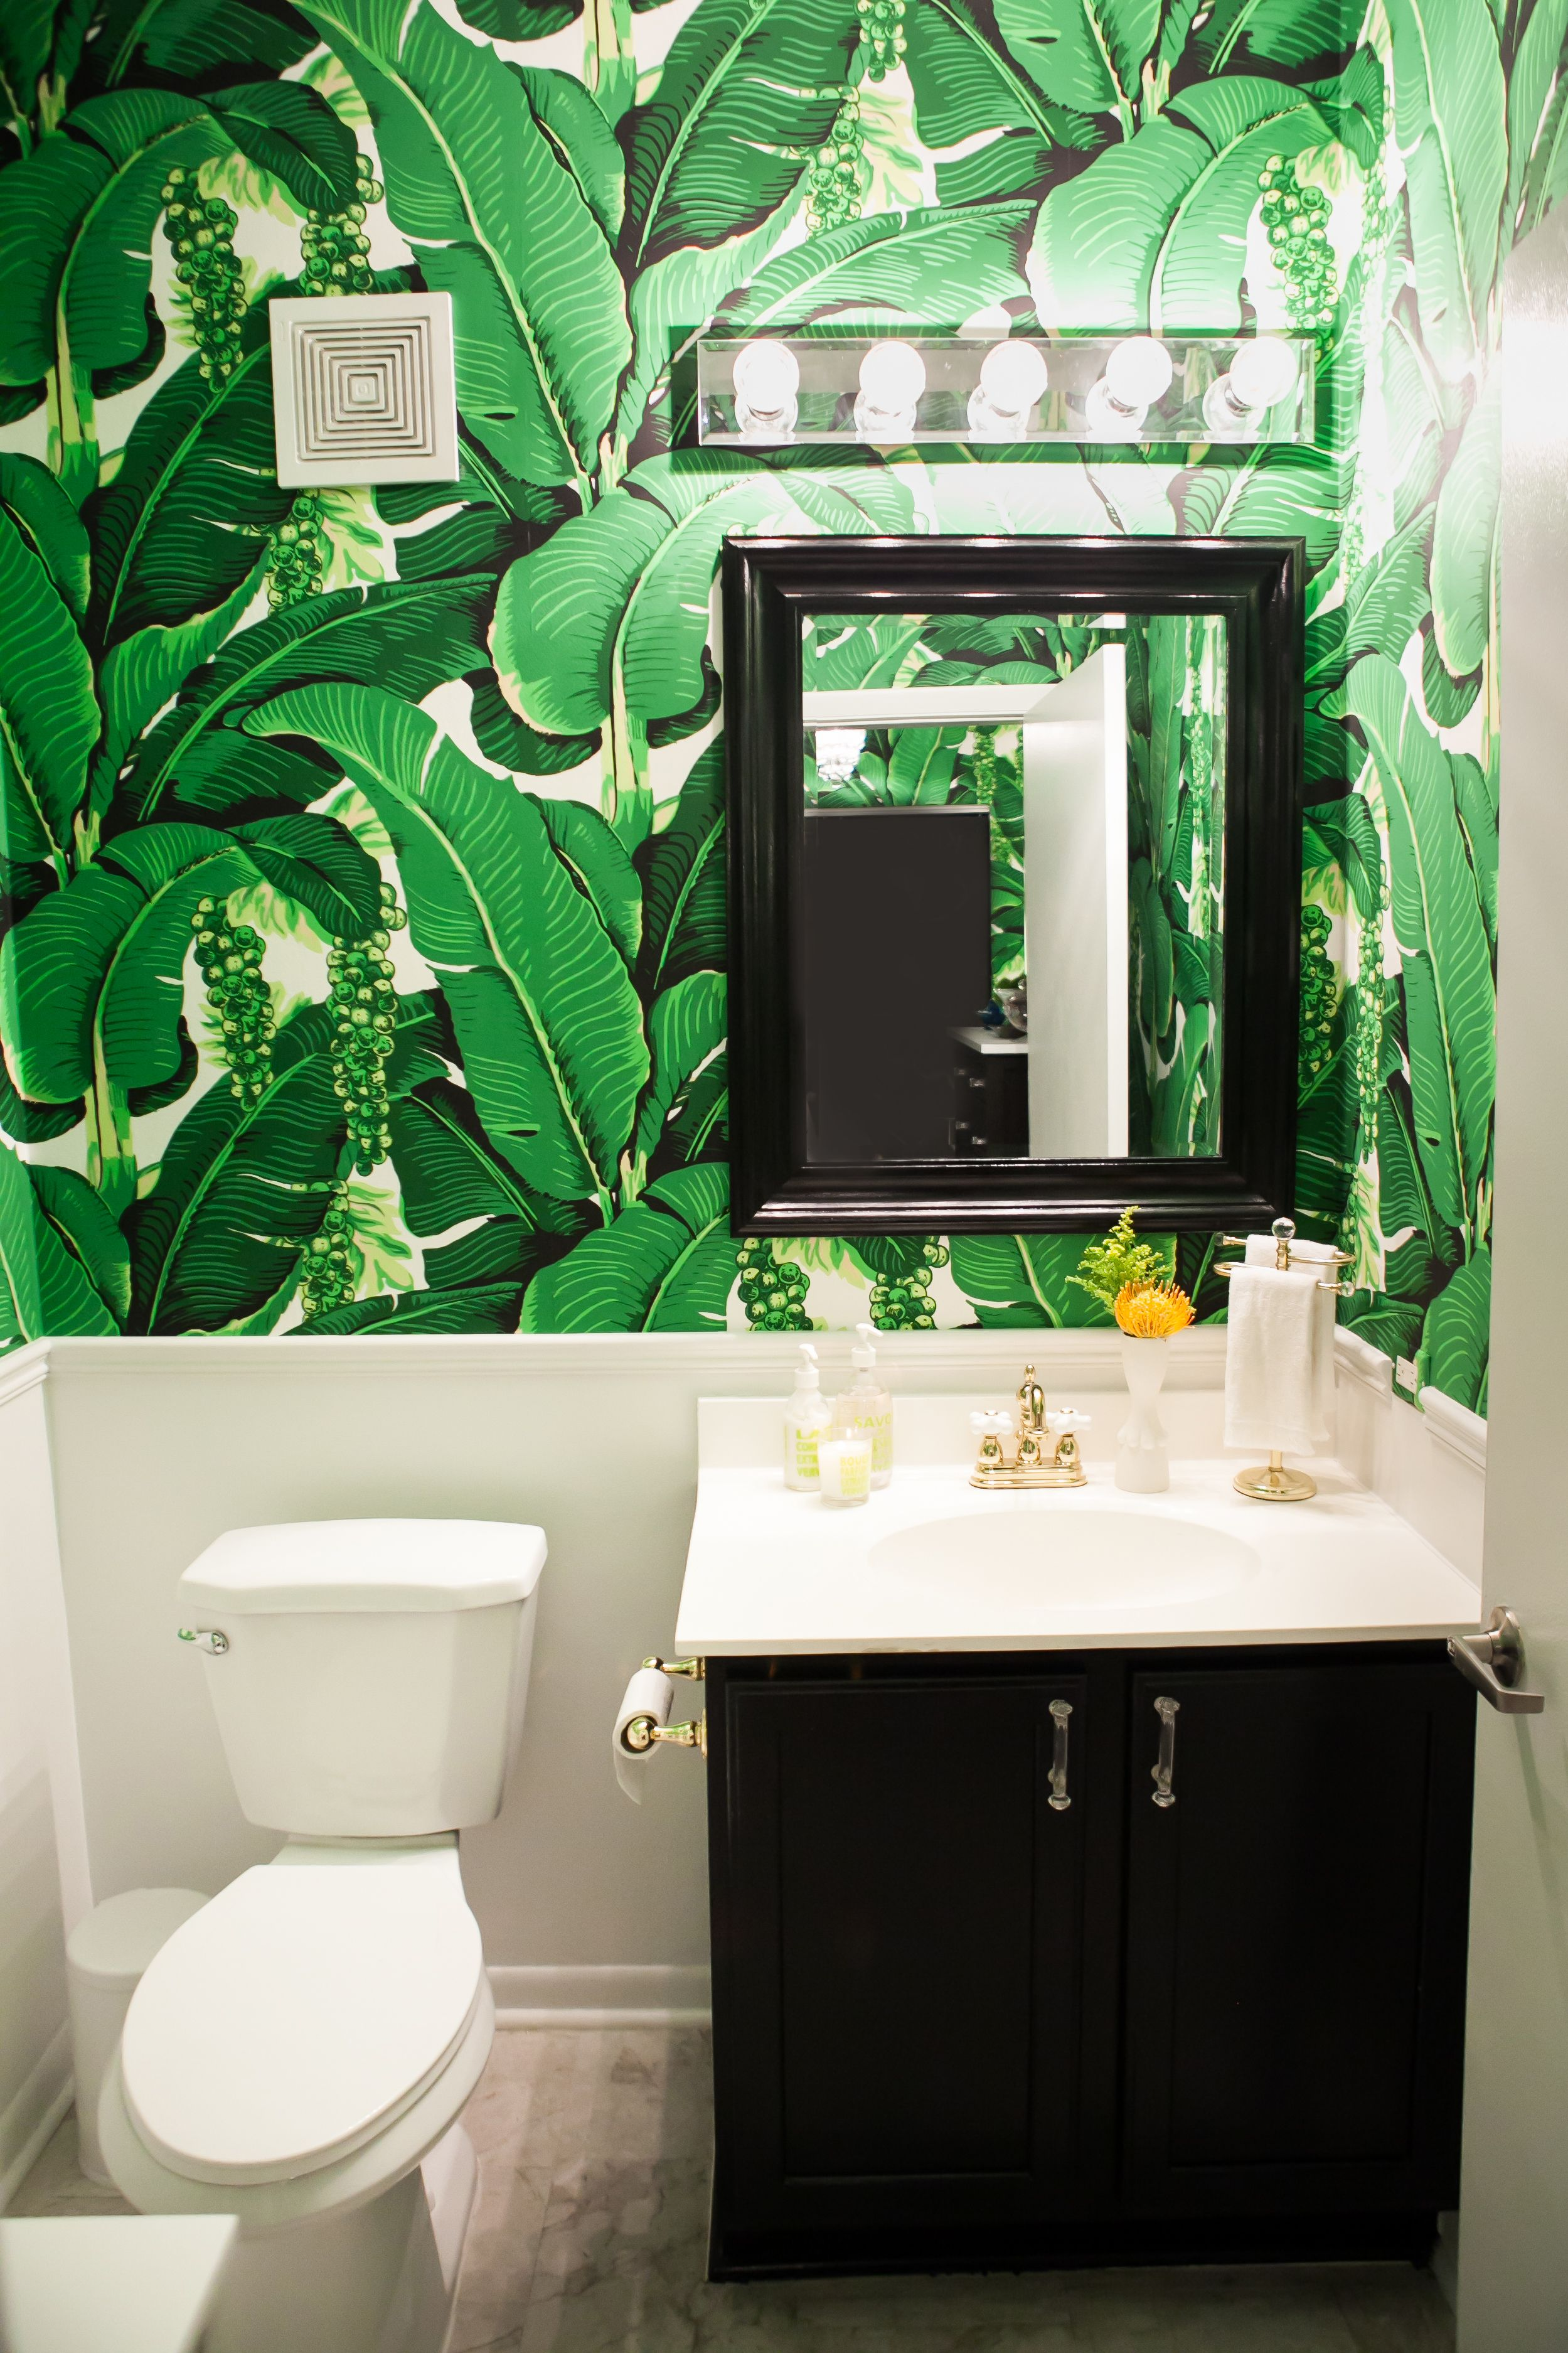 Amelia Canham Eaton S Chicago Apartment The Everygirl Bathroom Wallpaper Leaf Wallpaper Powder Room Wallpaper